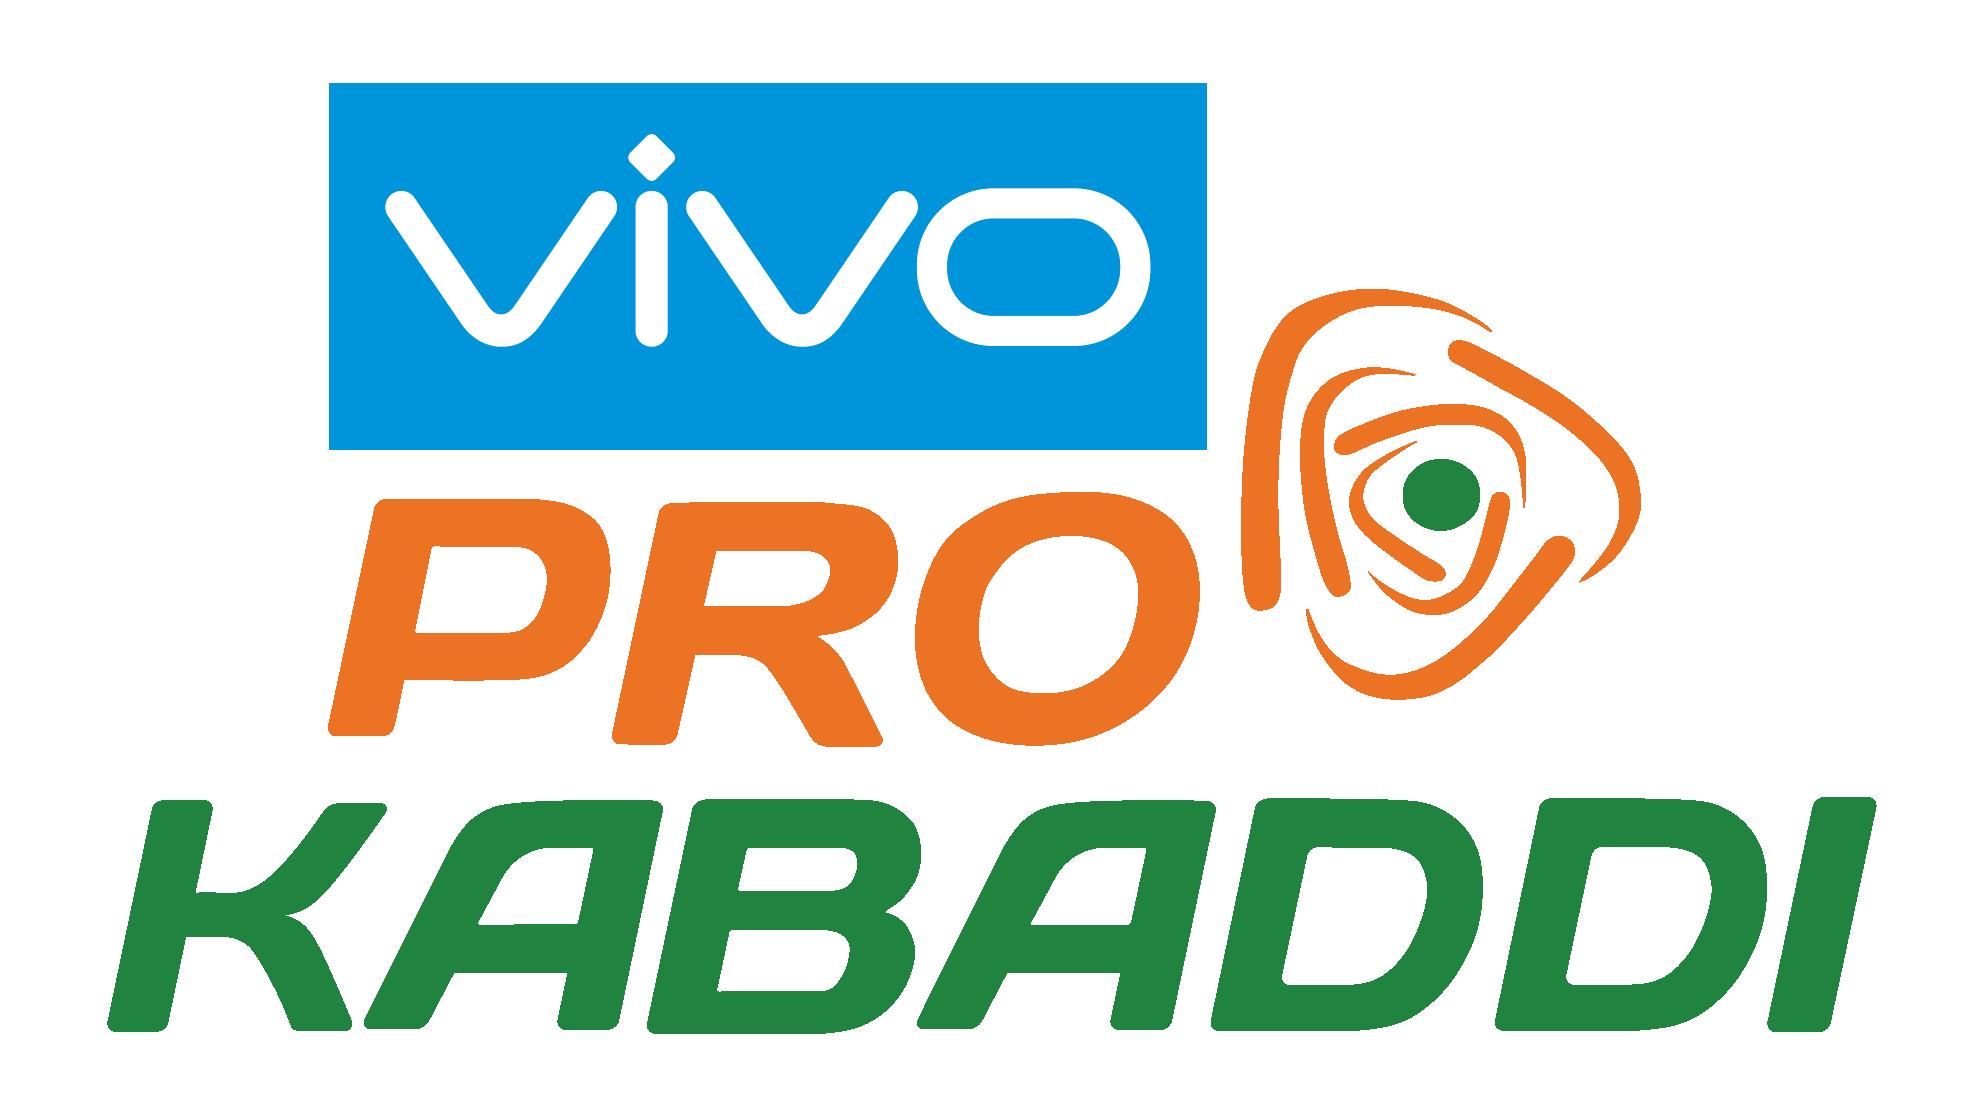 Best Defenders Of Pro Kabaddi Season 7 Sports News And Analysis